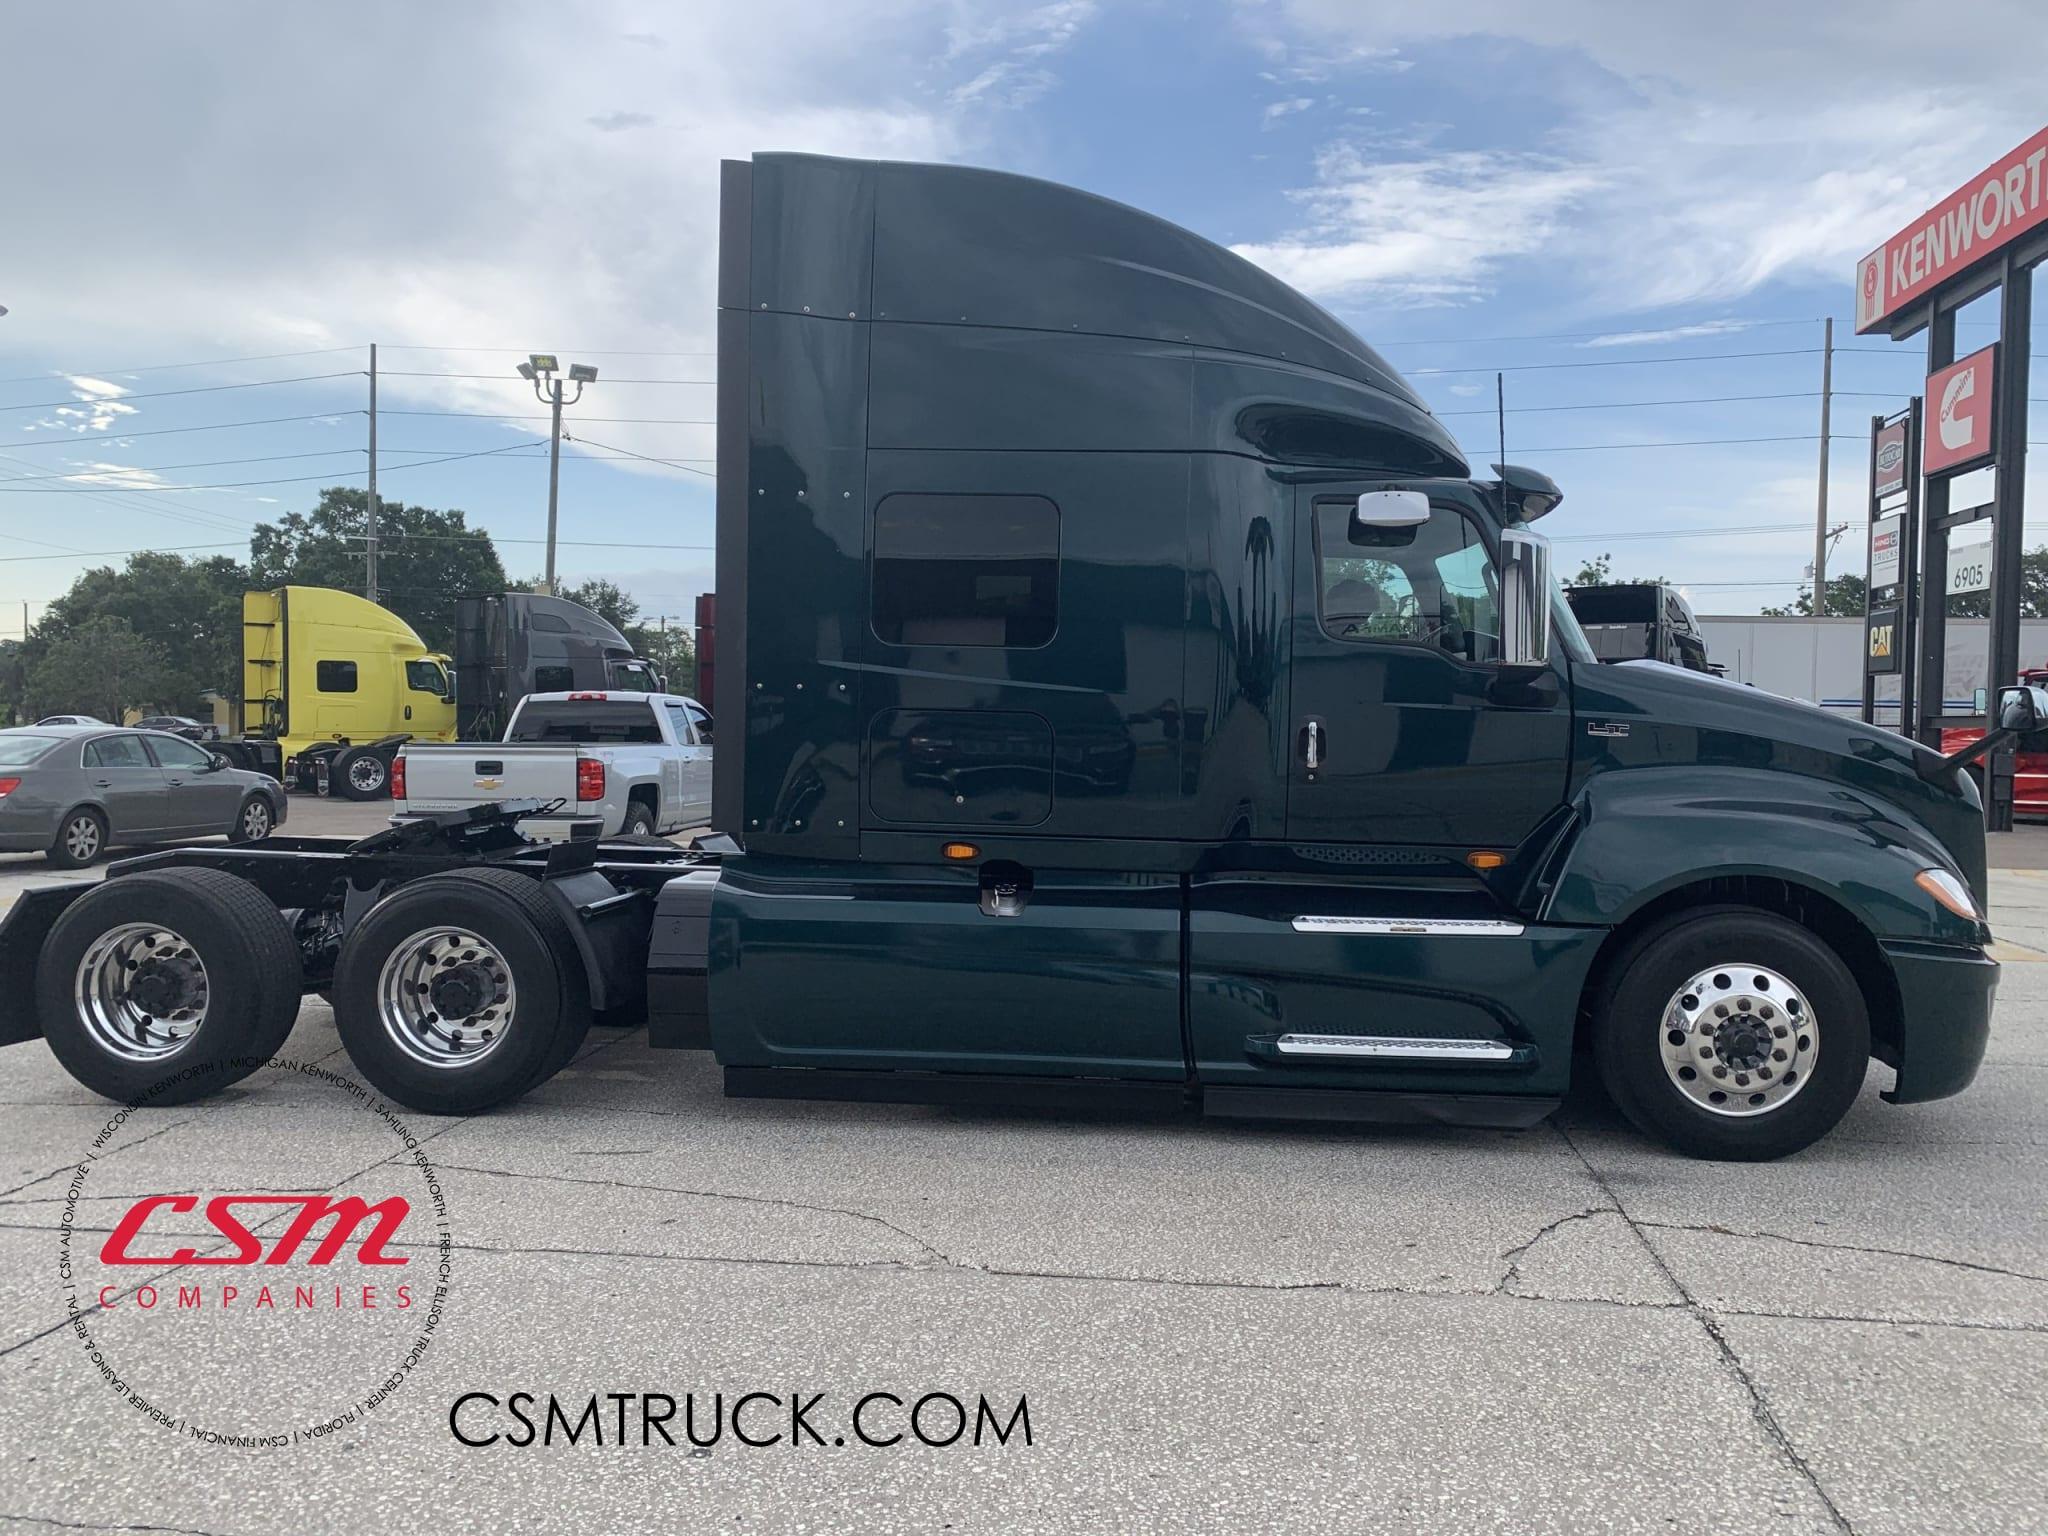 2018 International LT UJN446131 full